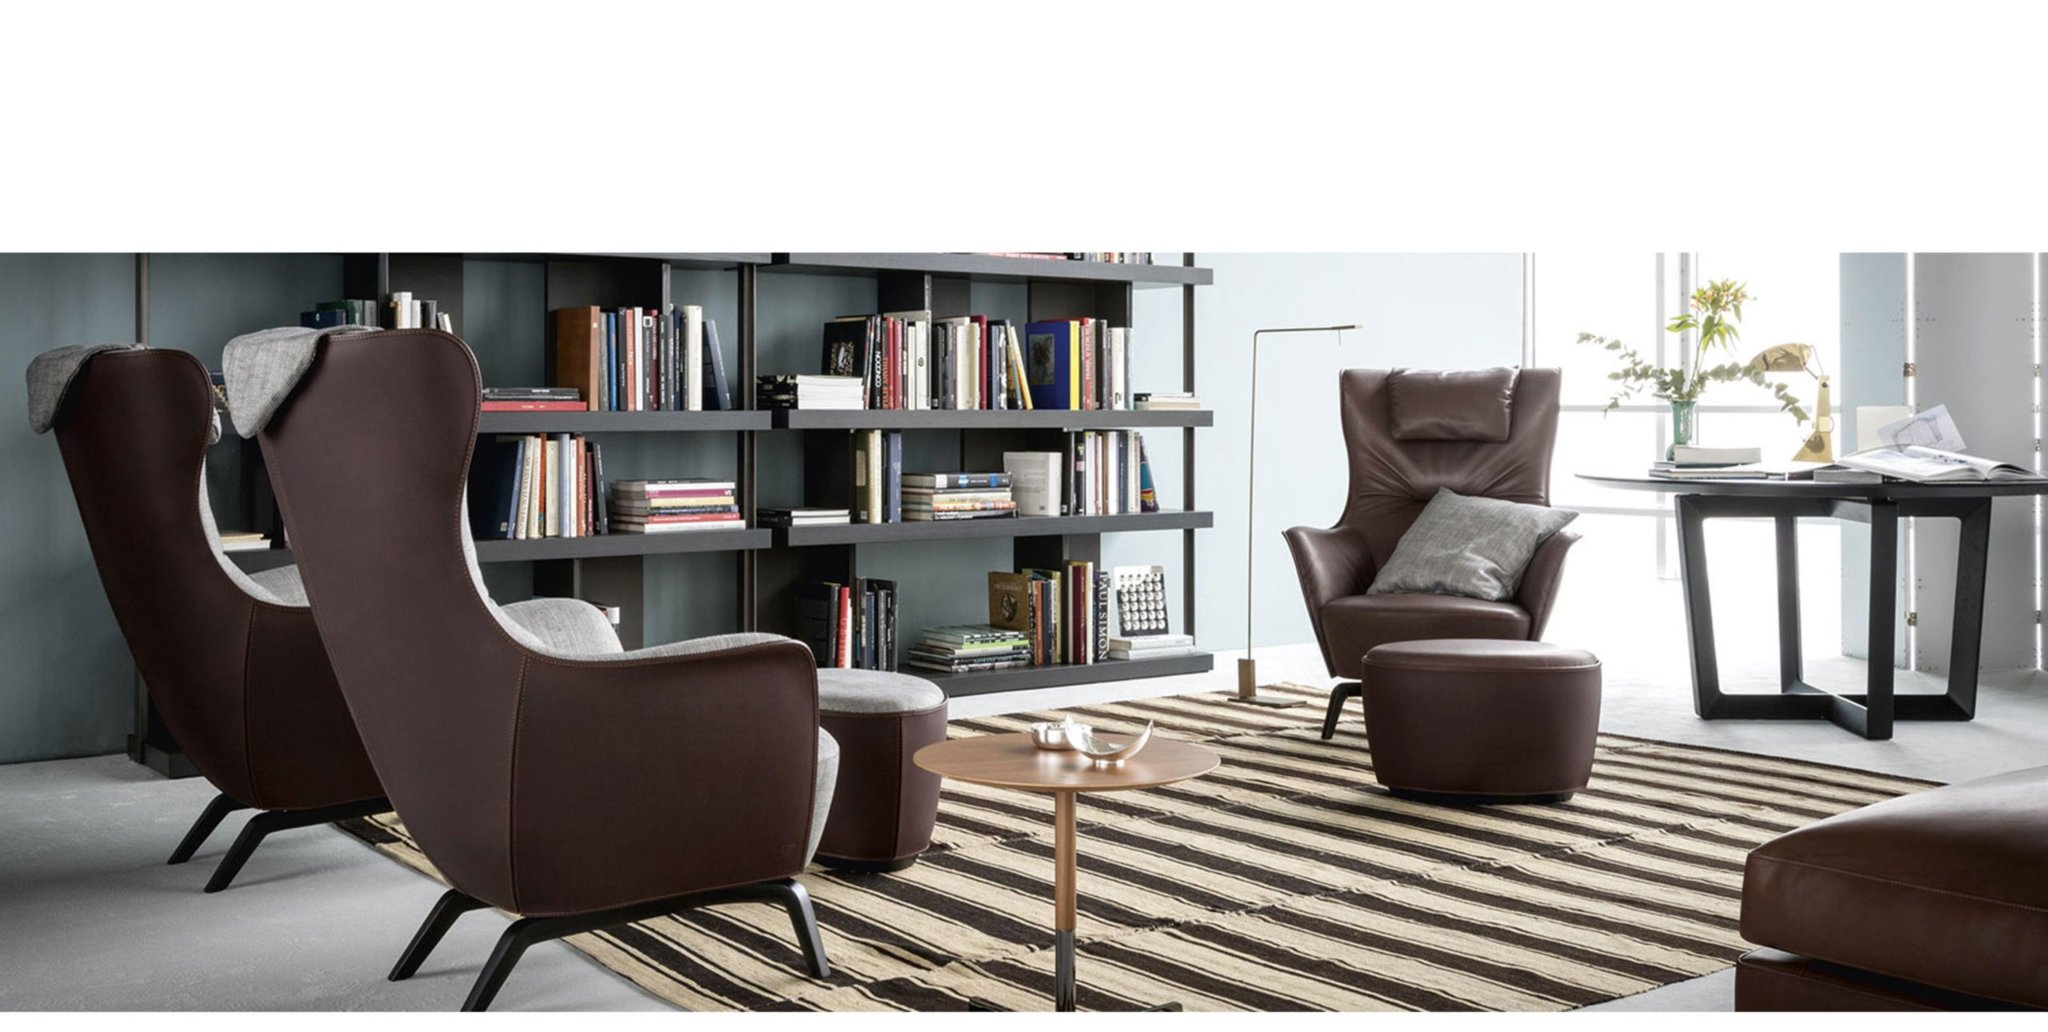 mamy blue puff poltrona frau eurasia concept. Black Bedroom Furniture Sets. Home Design Ideas